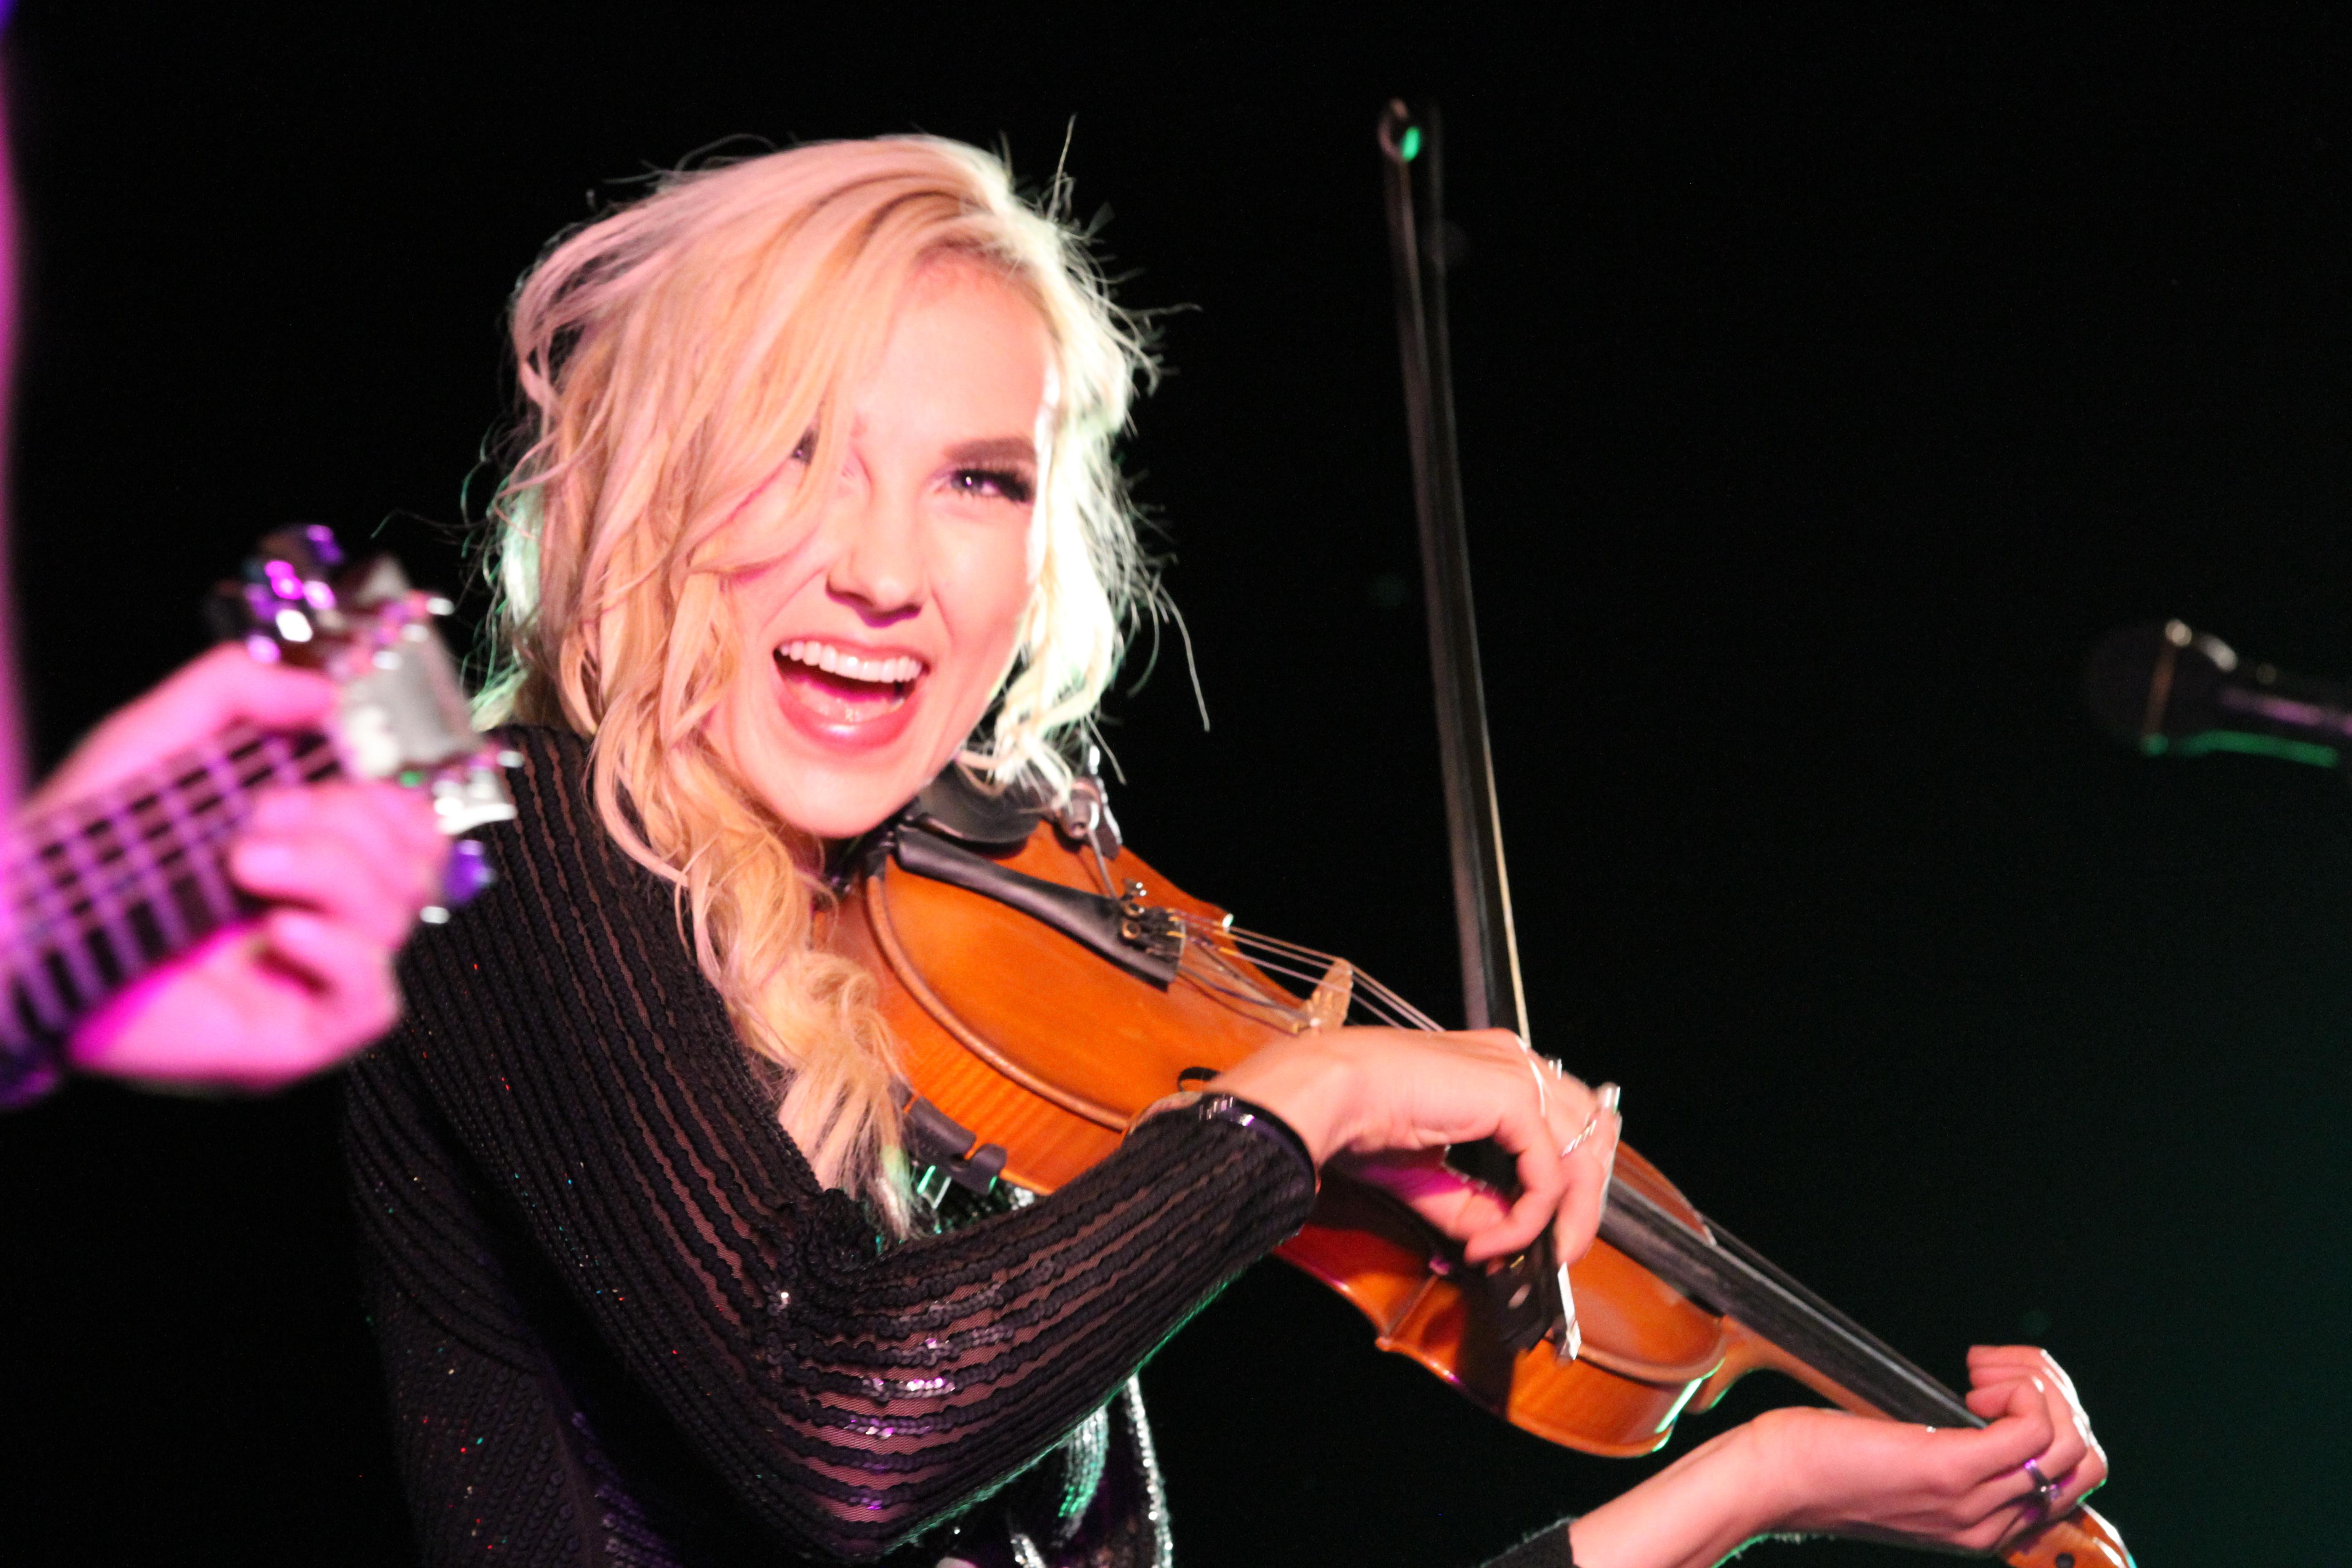 Roseau native Kari Nelson brings Nashville duo Kari & Billy to RiverFest